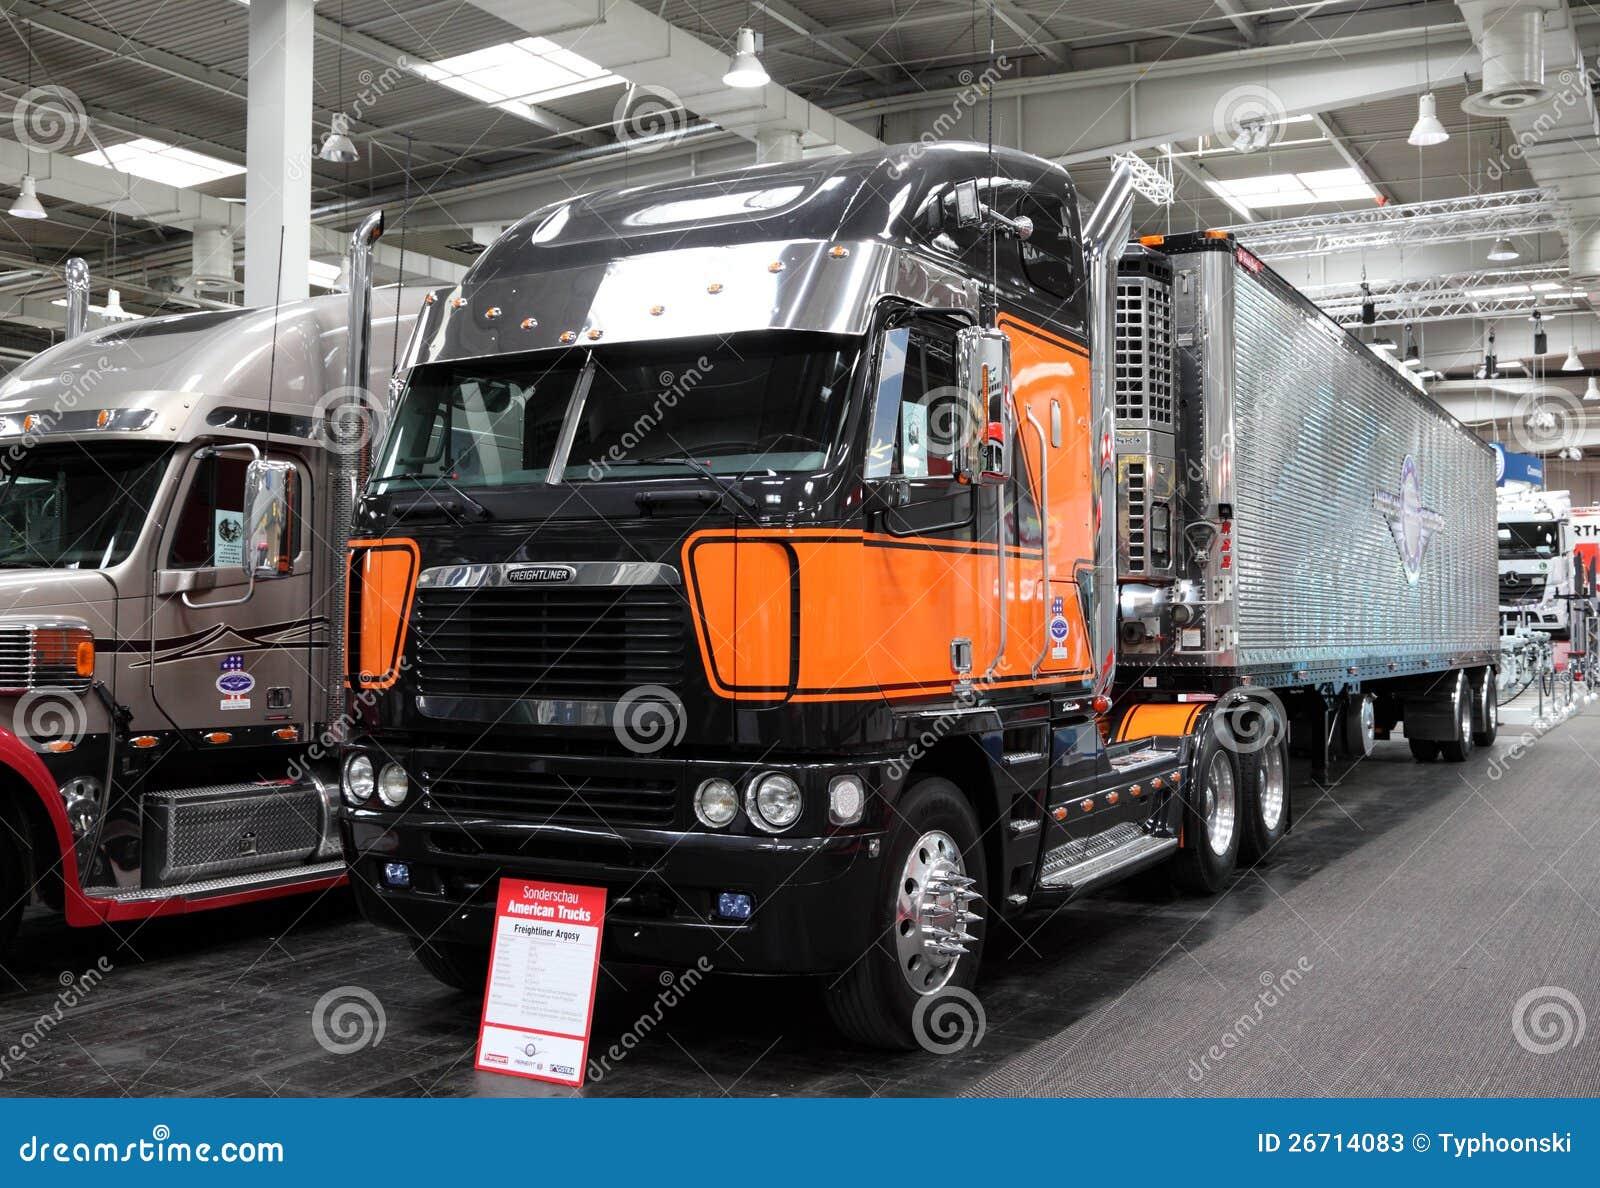 Freightliner Argosy Truck Editorial Stock Photo - Image: 26714083